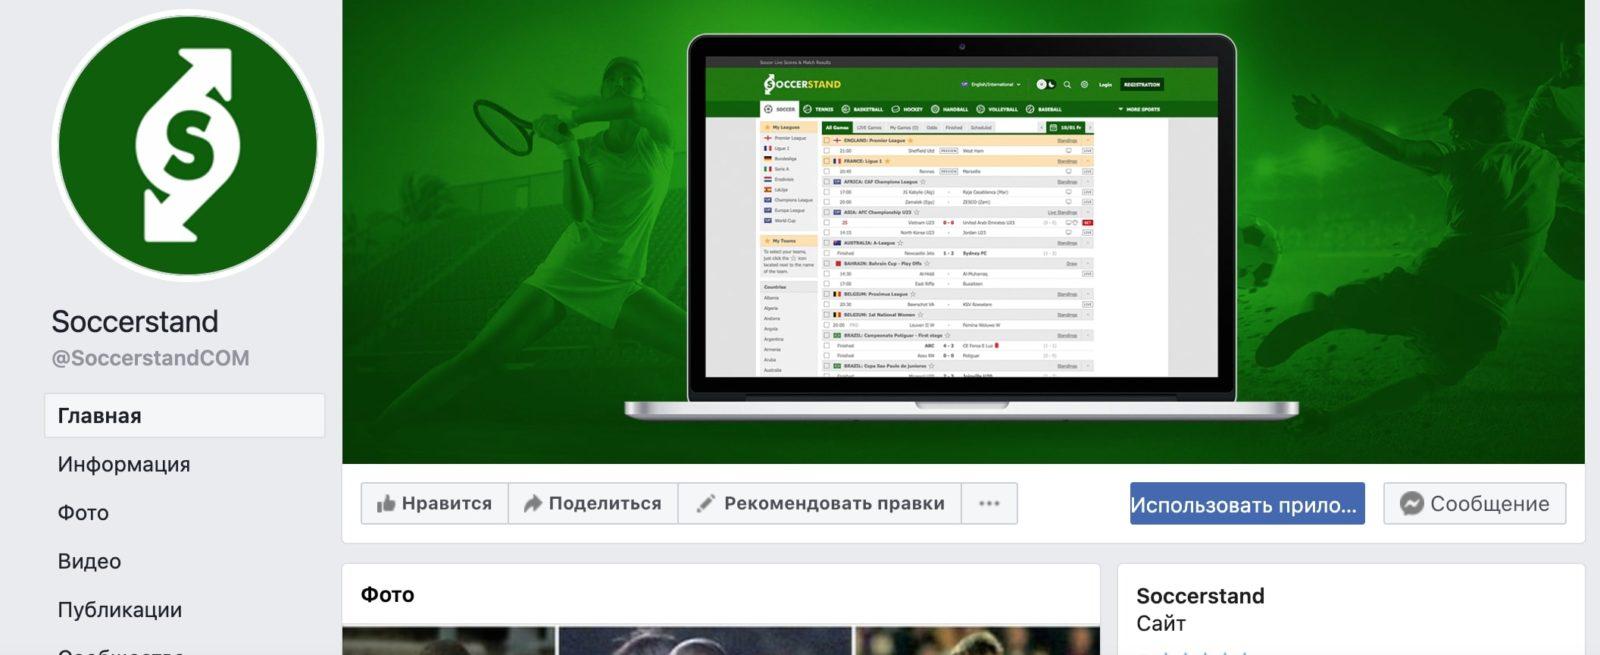 Фейсбук каппера www soccerstand com ru (Соккерстенд ру)